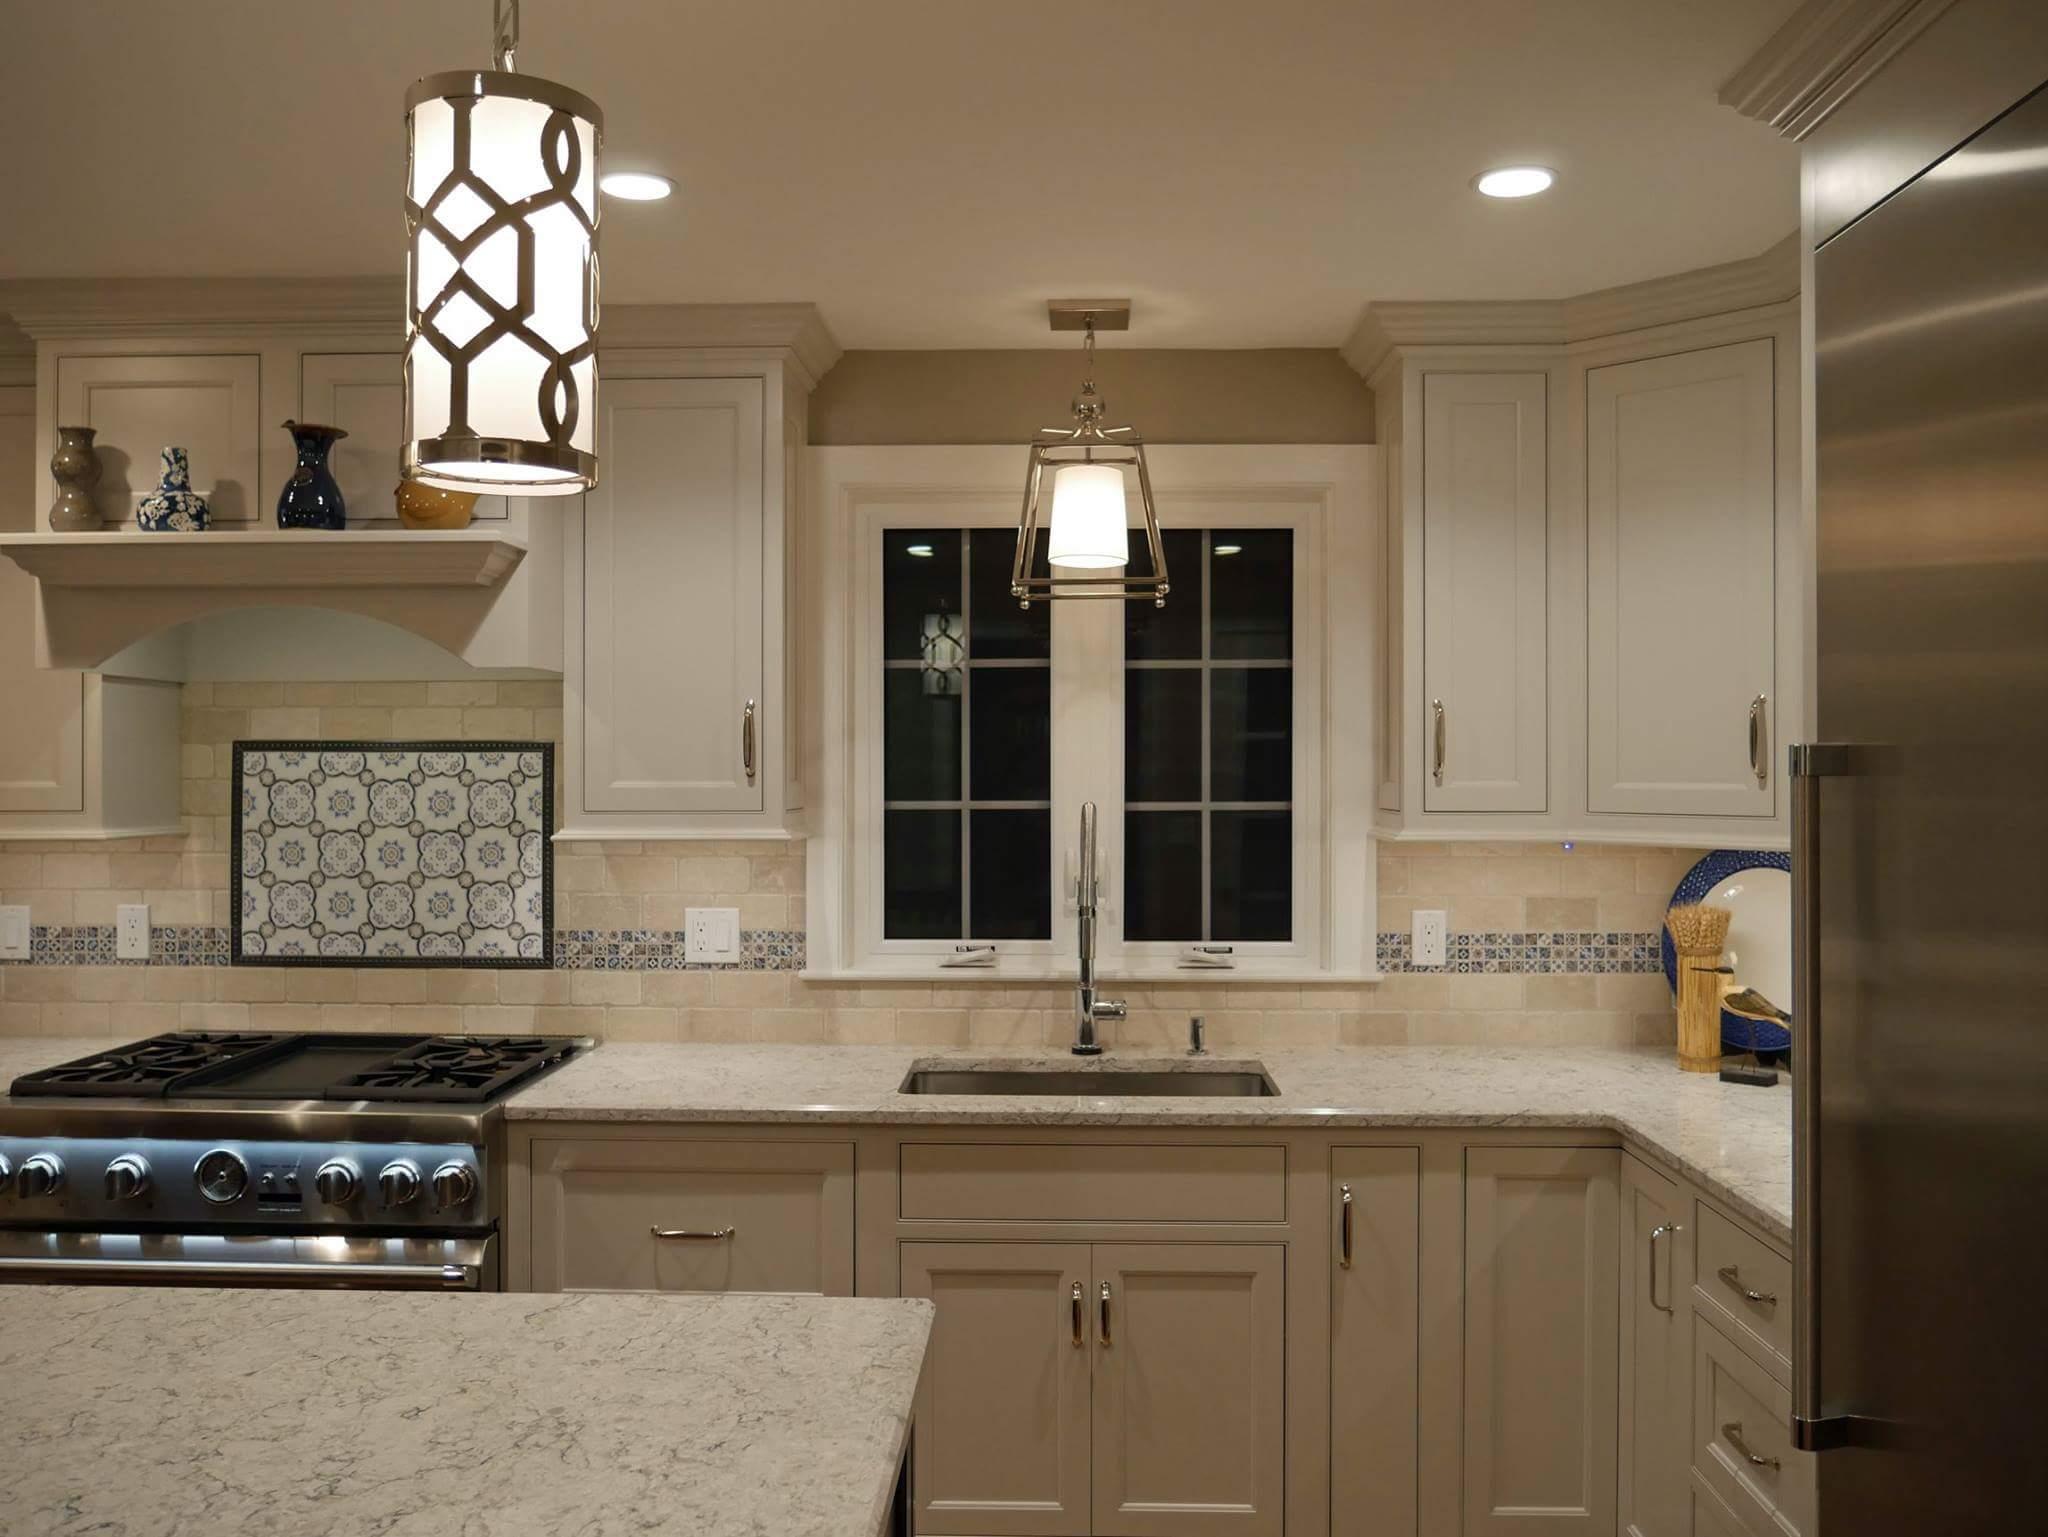 Decorative Lighting in Kitchen